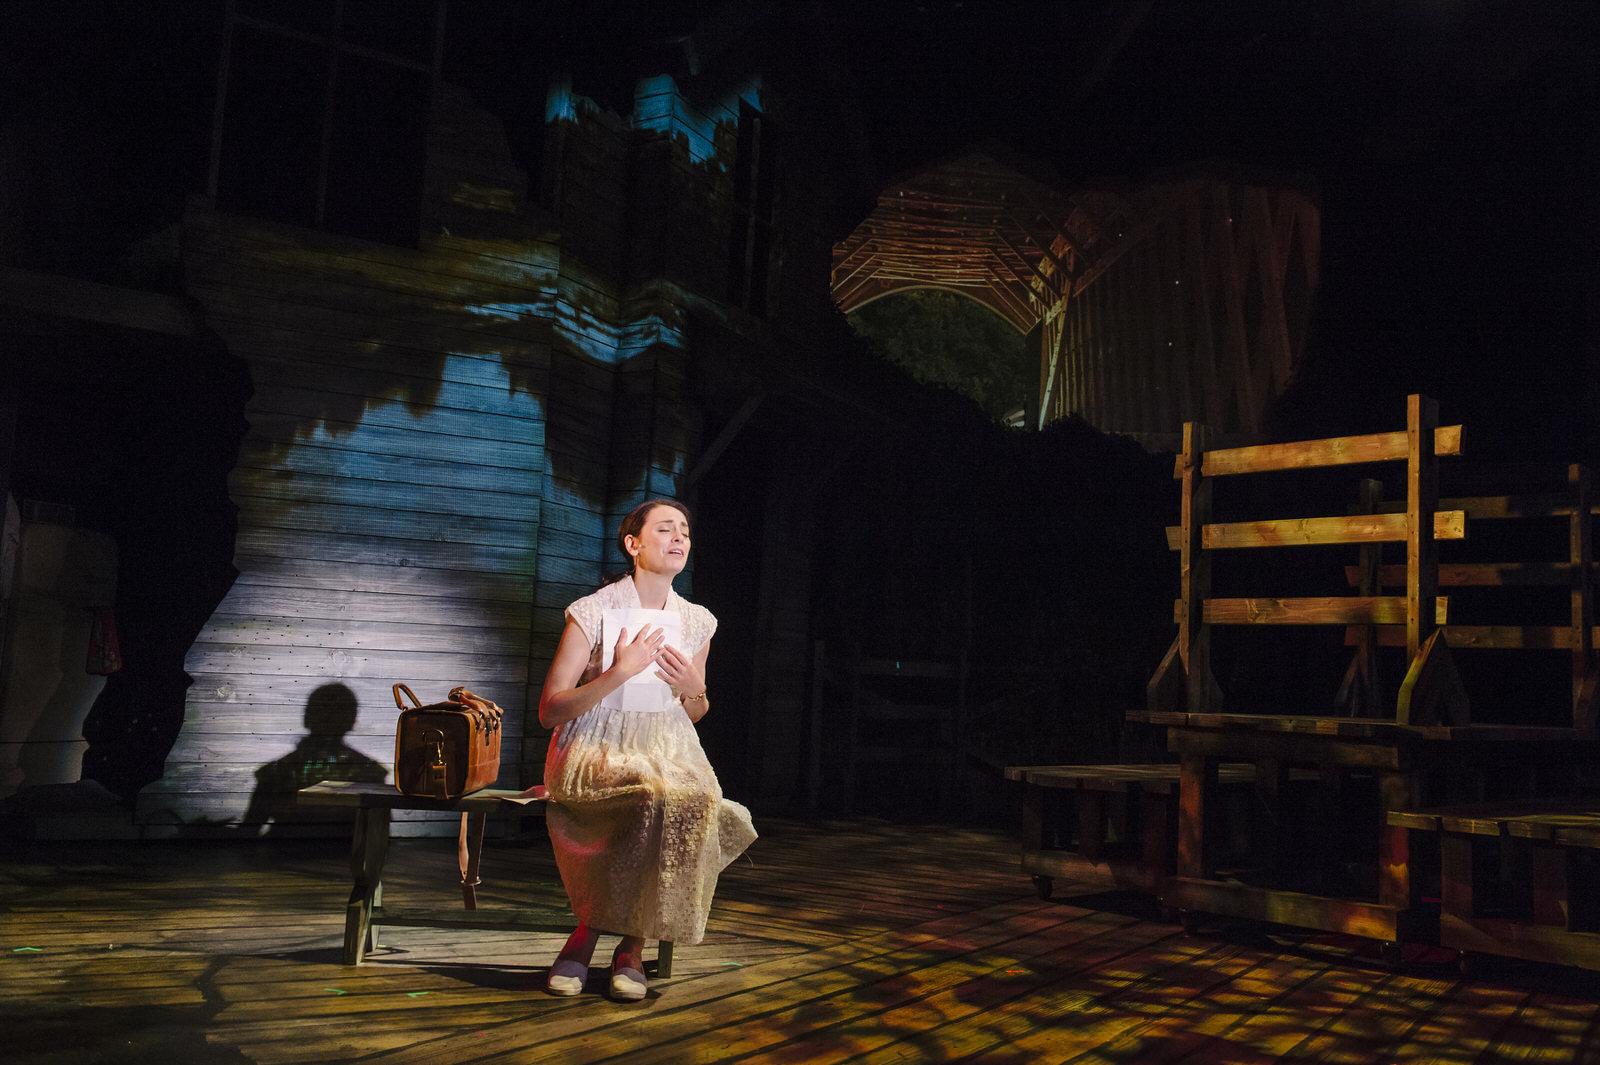 Susan Derry as Francesca in Bridges of Madison County at Keegan Theatre